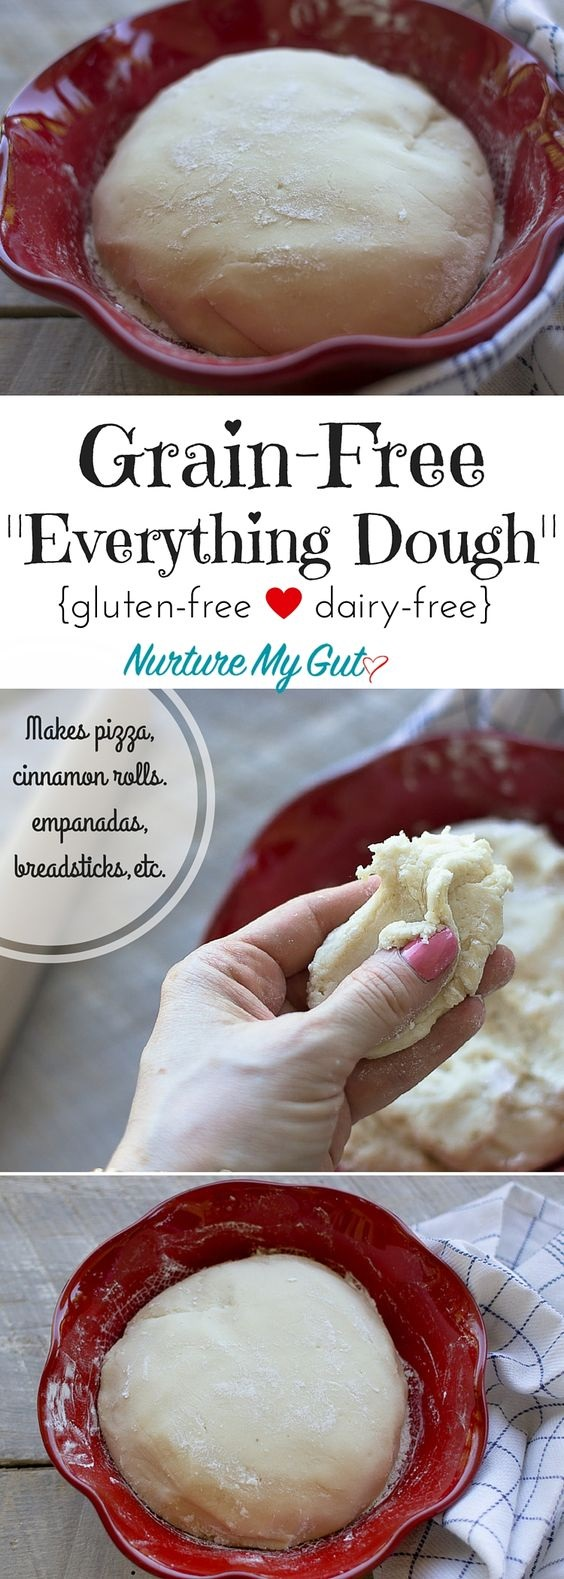 Grain Free Everything Dough